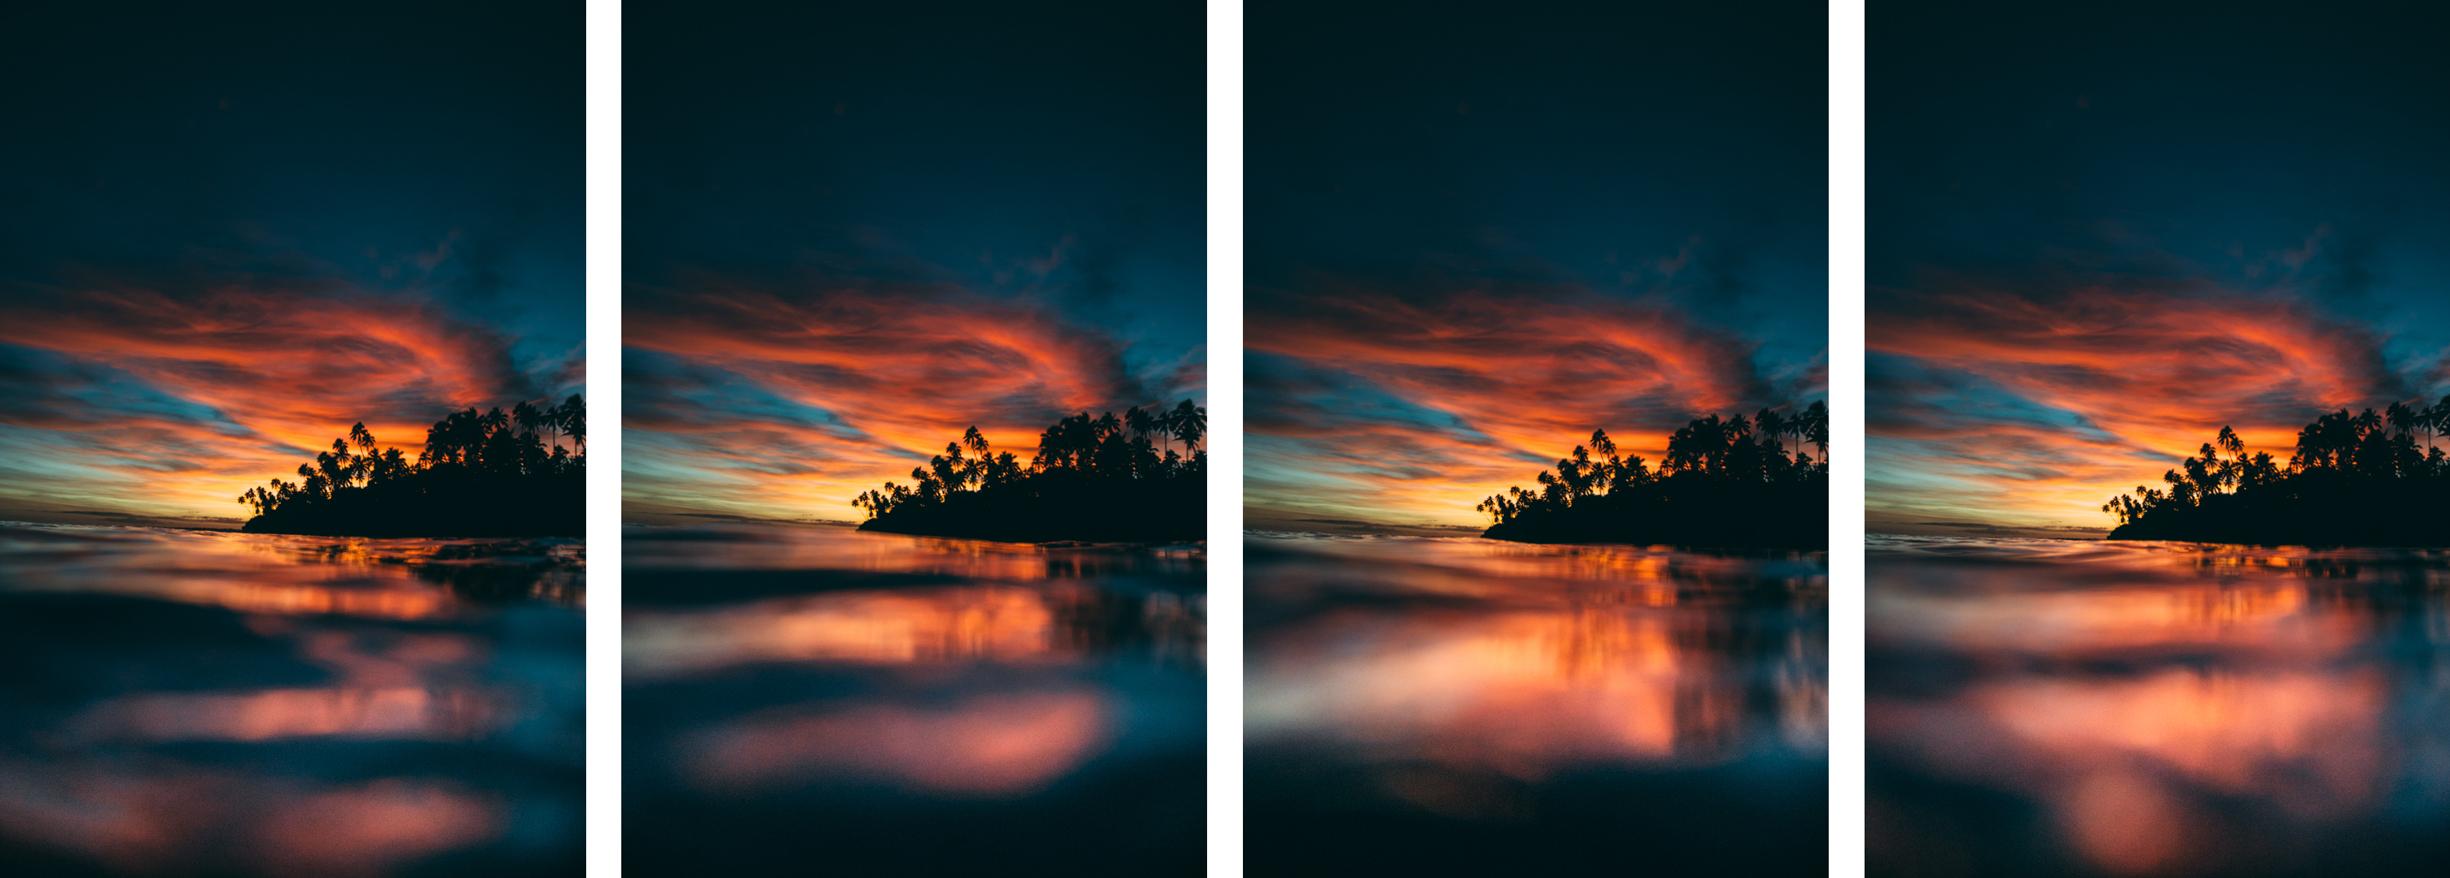 Samoa-Lola-Photography-20.jpg